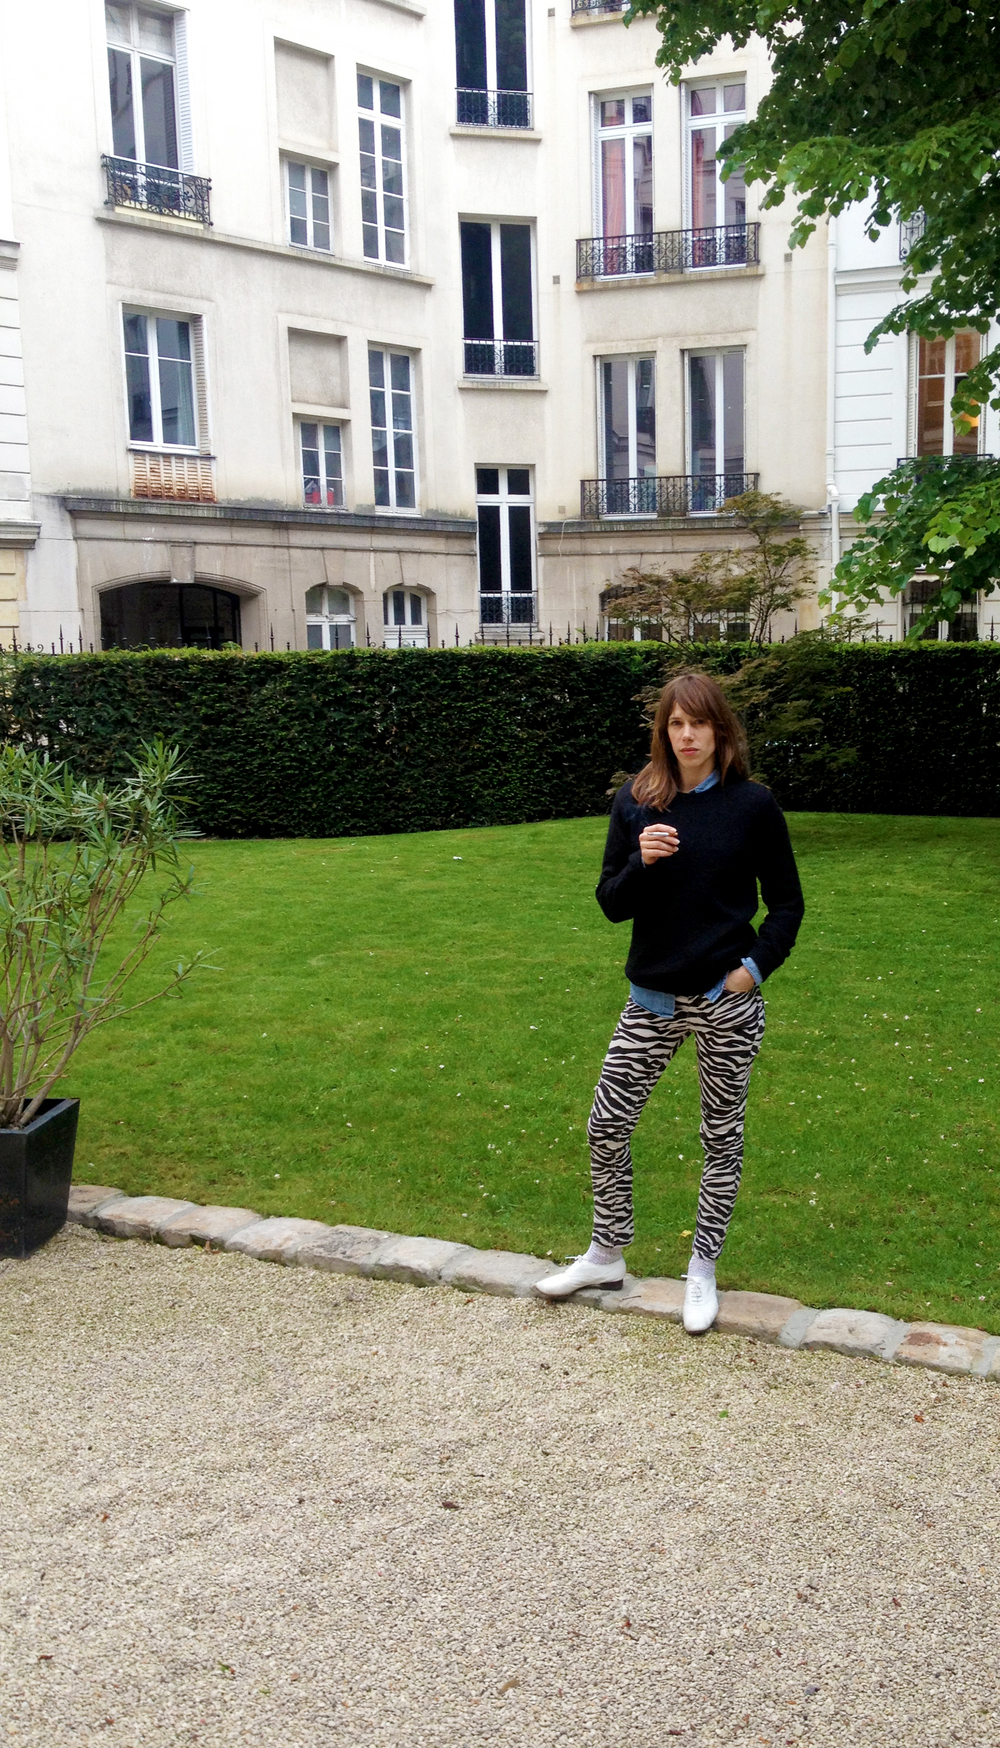 Natacha Le Jeune